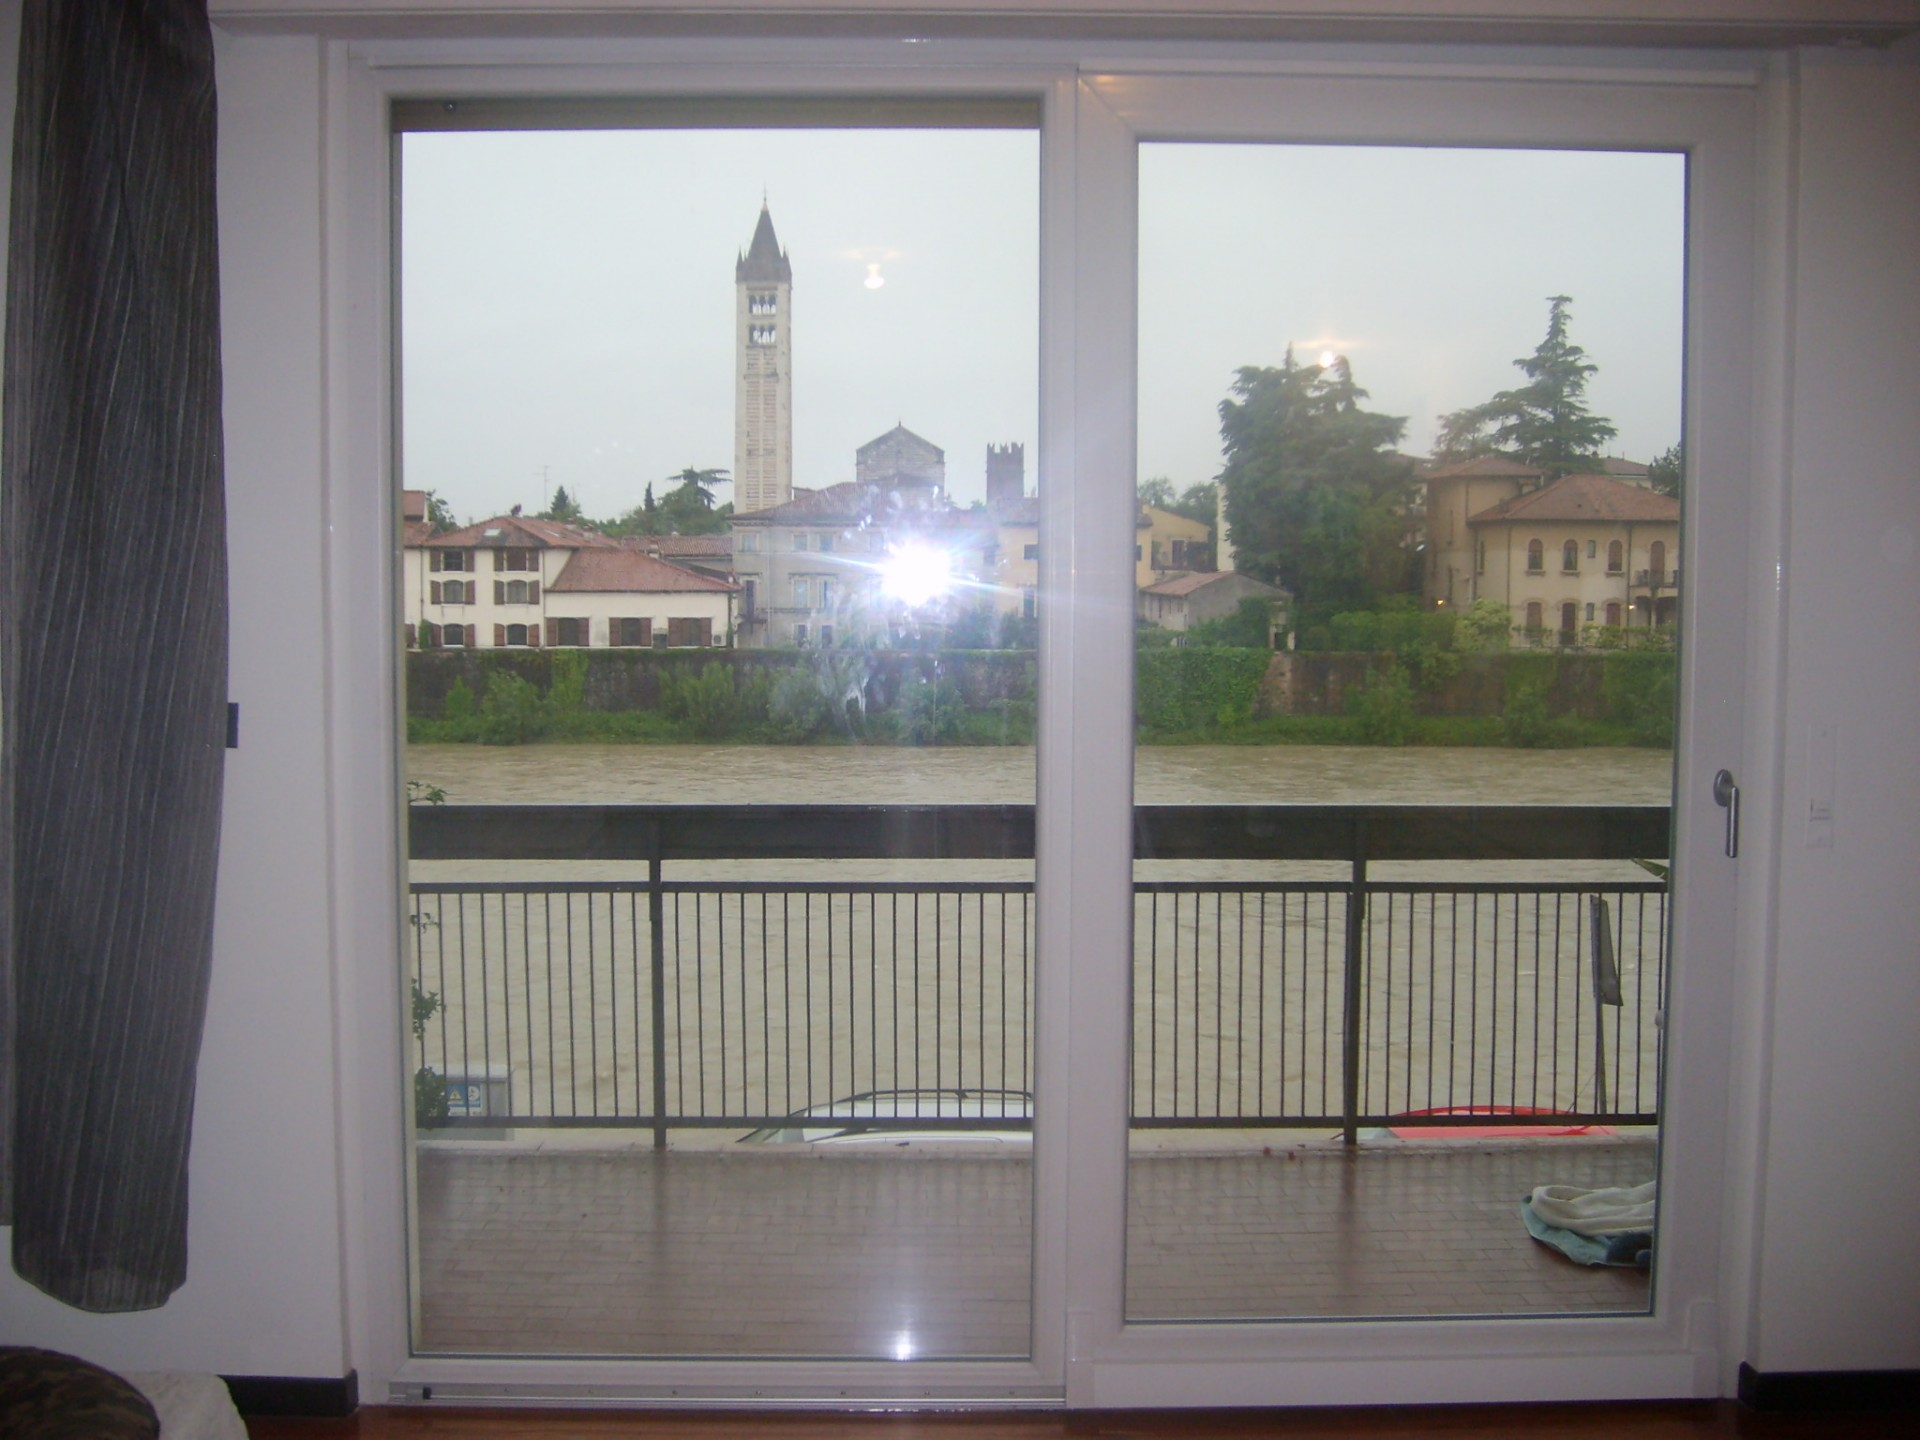 Serramento scorrevole traslante infix - Ferramenta per finestre scorrevoli ...